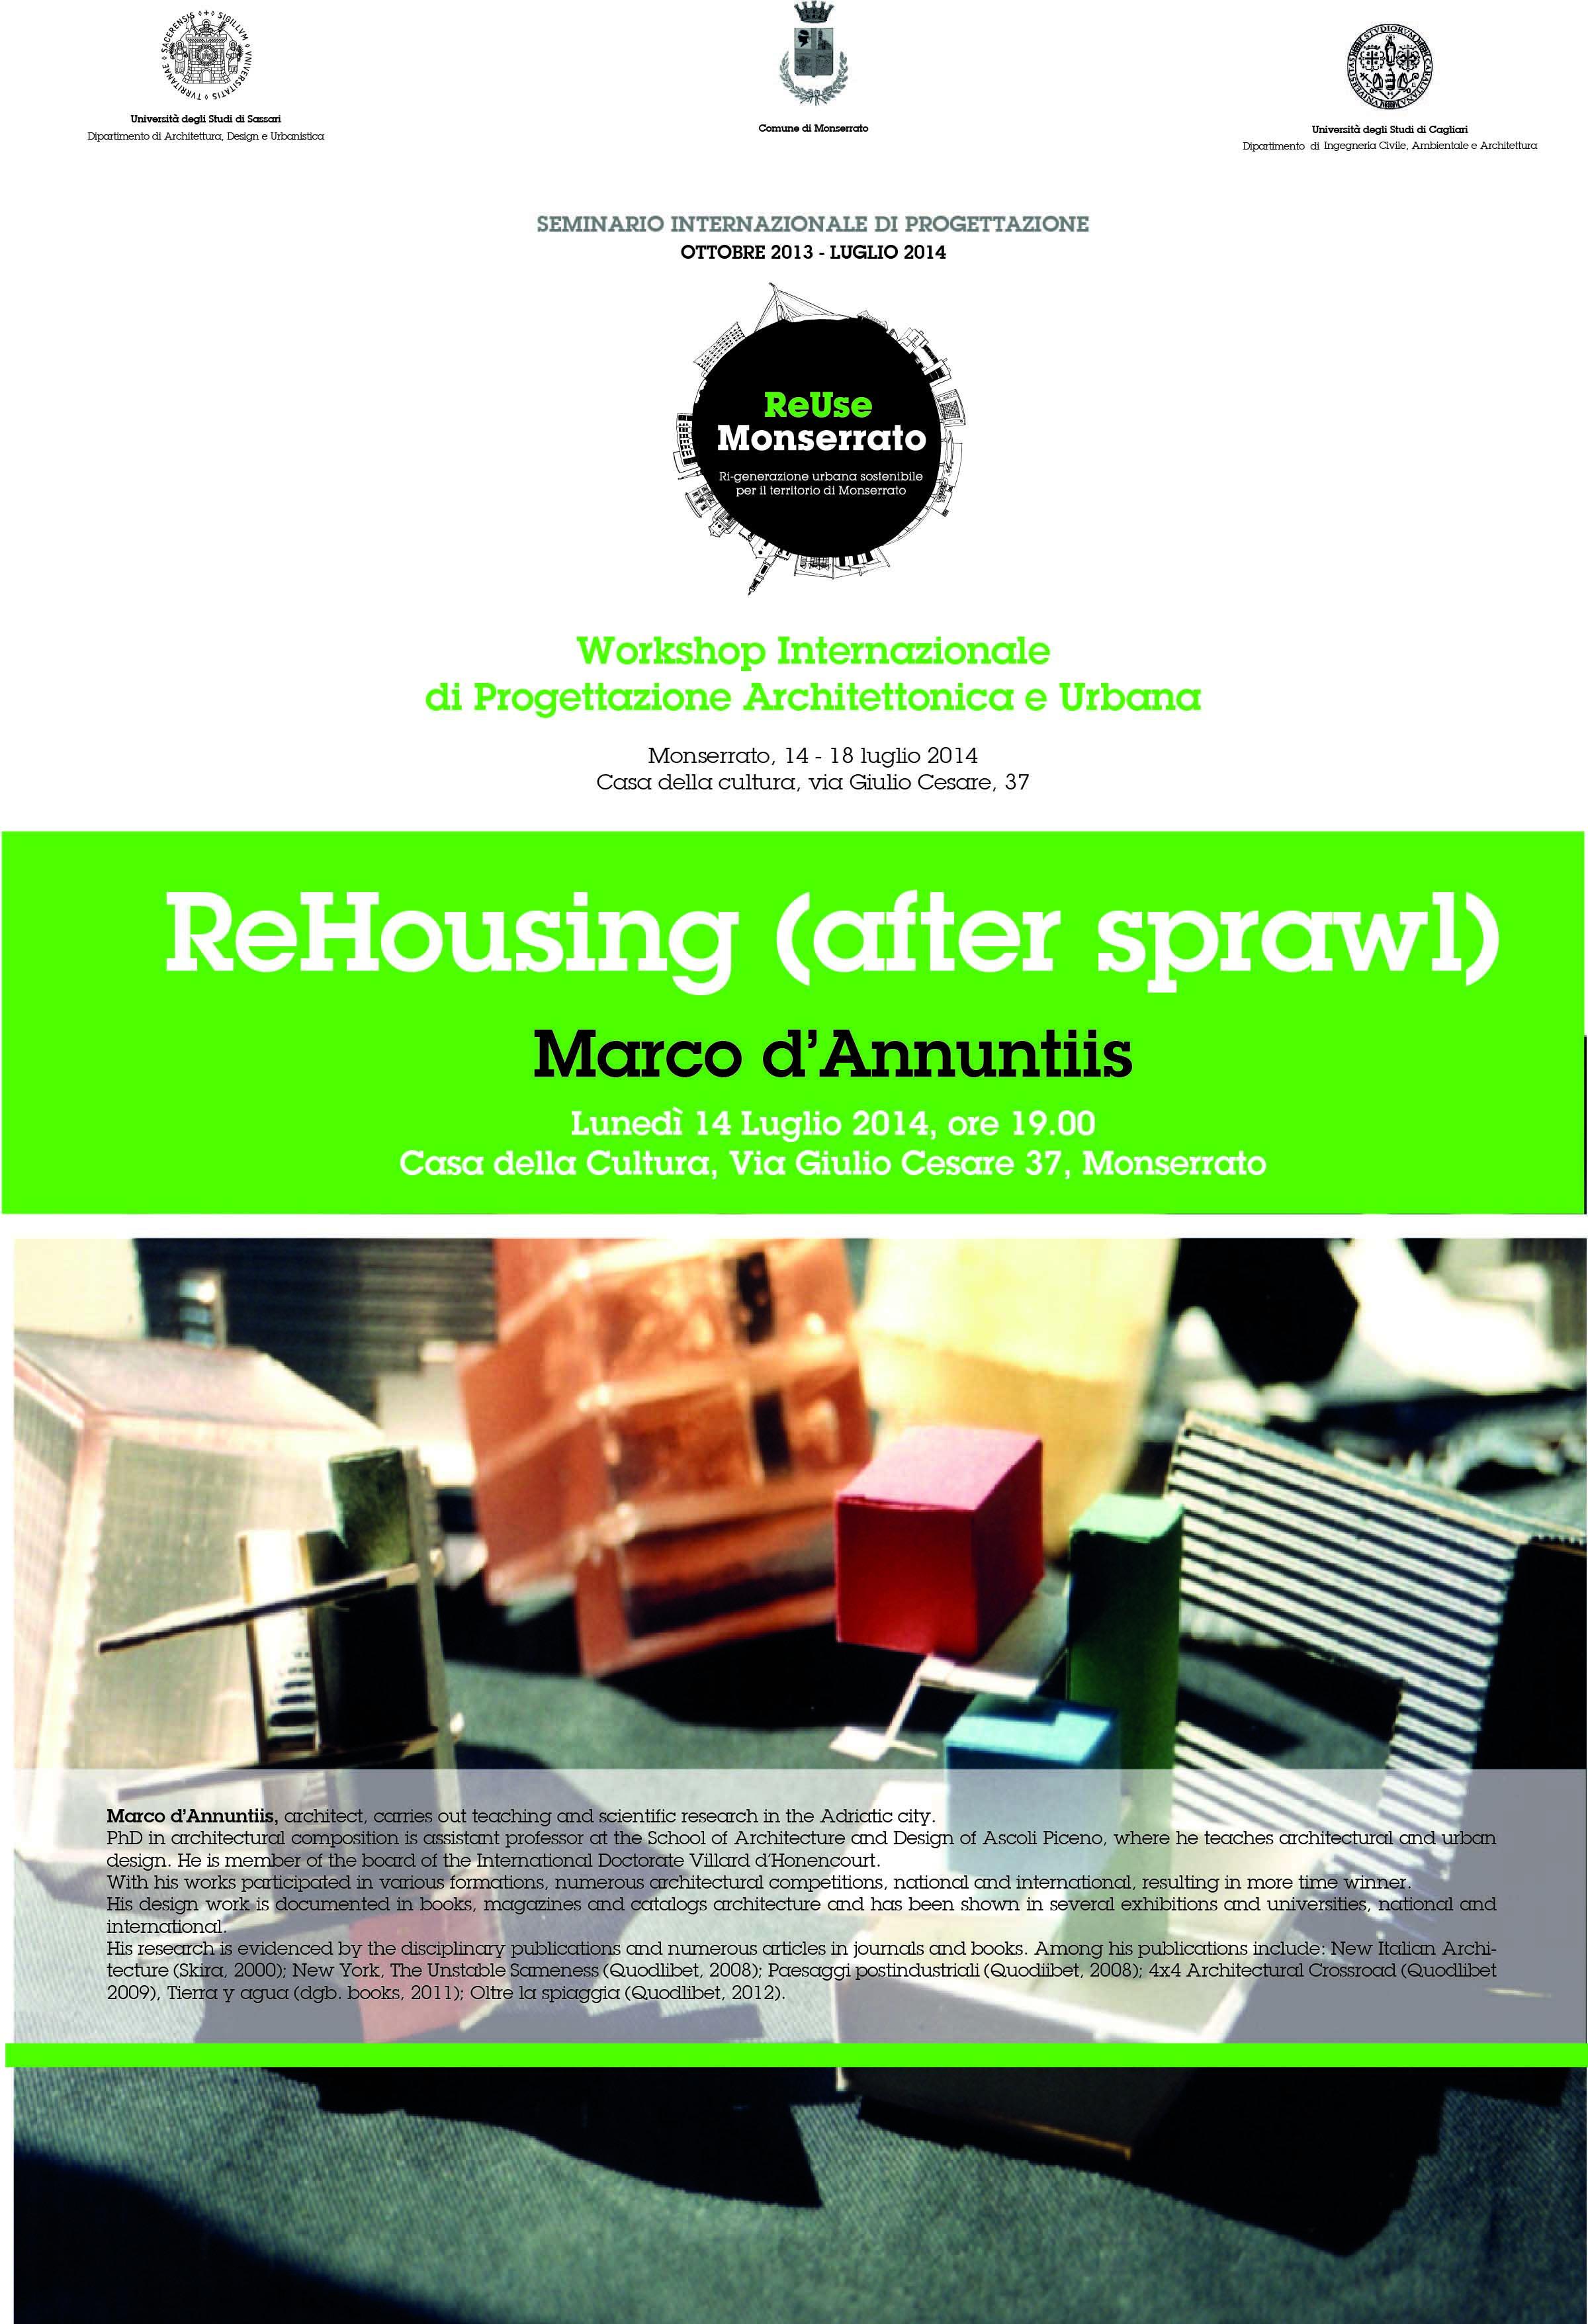 ReHousing (after sprawl)